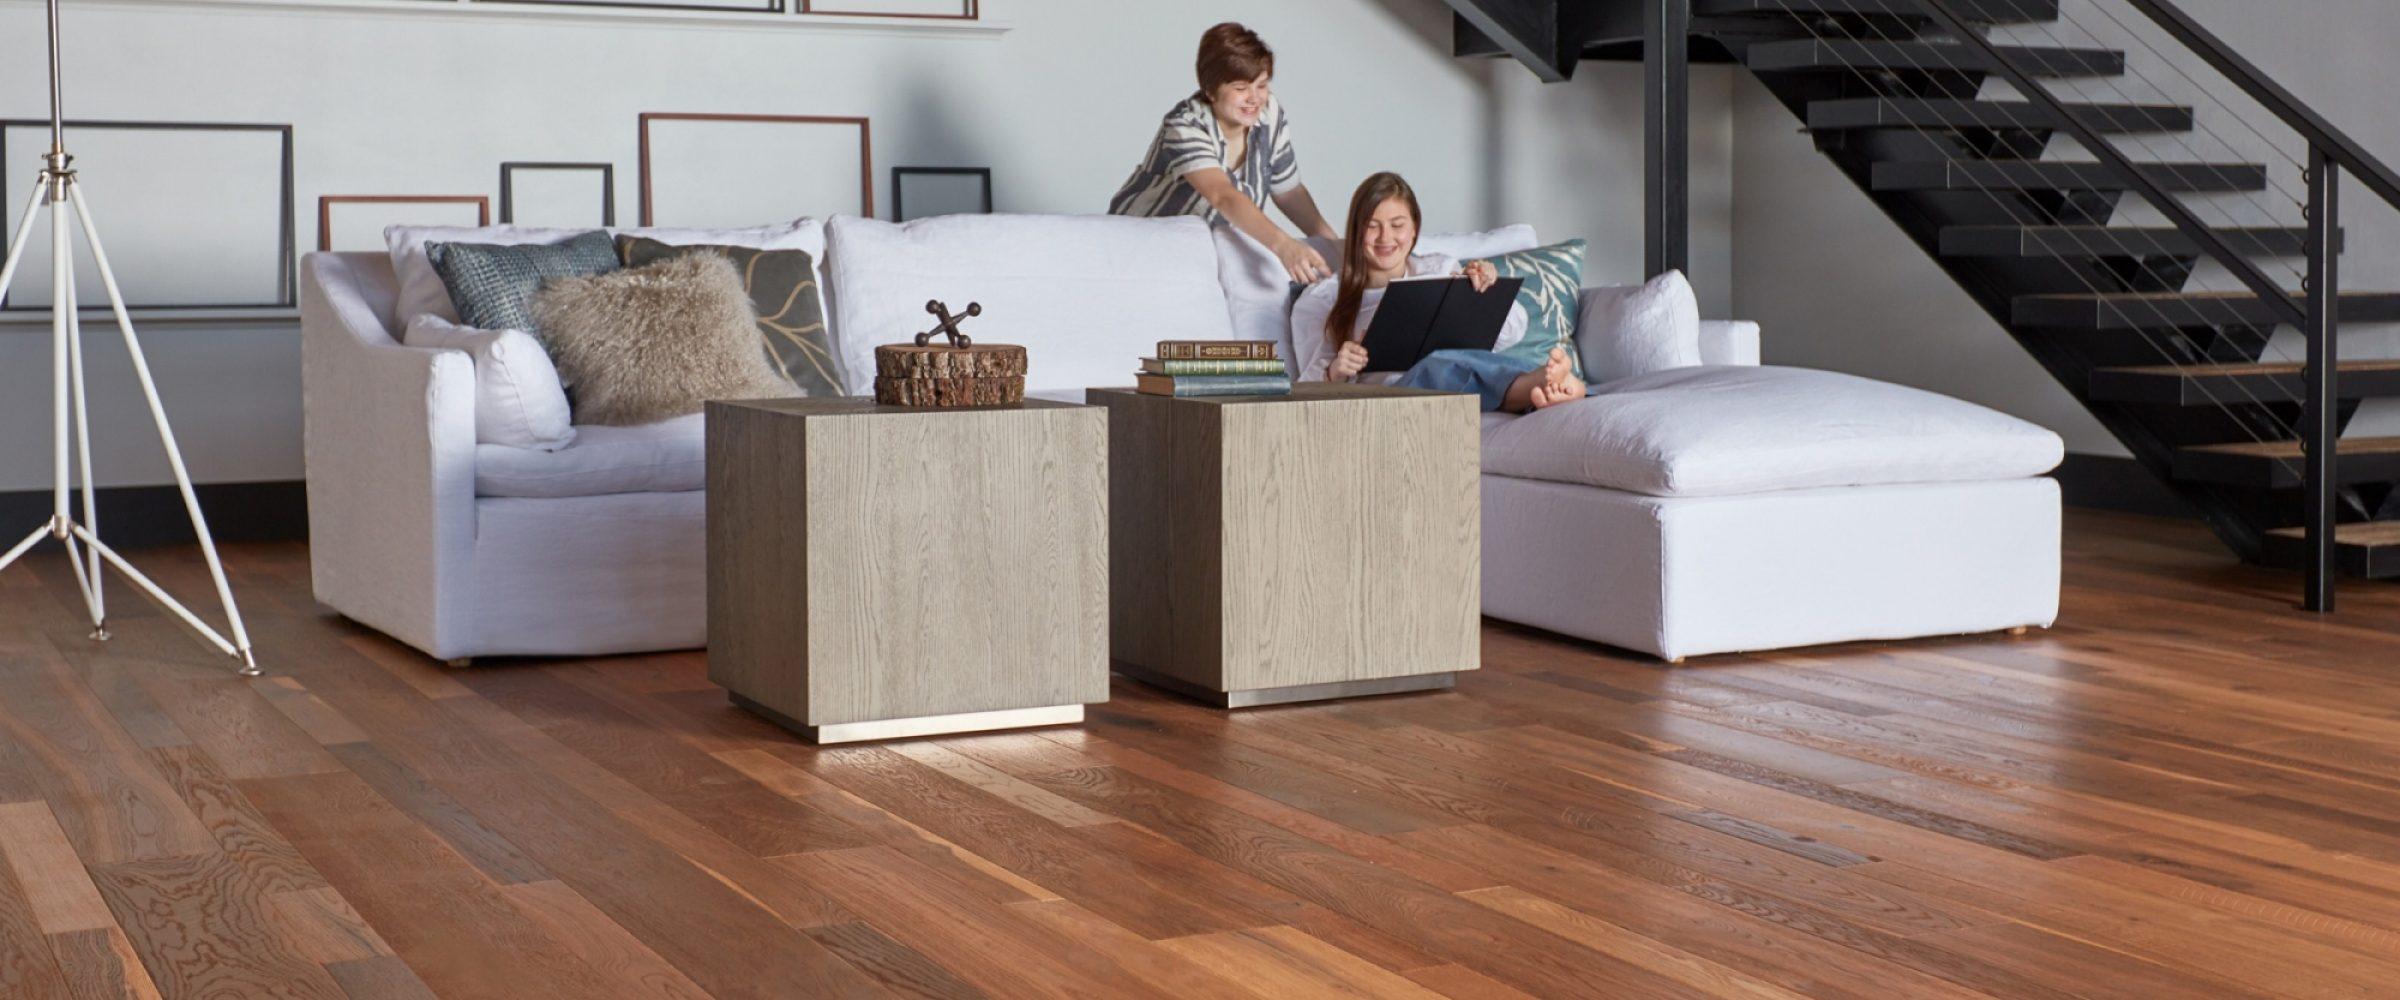 Real Wood Floors | We make beautiful solid and engineered